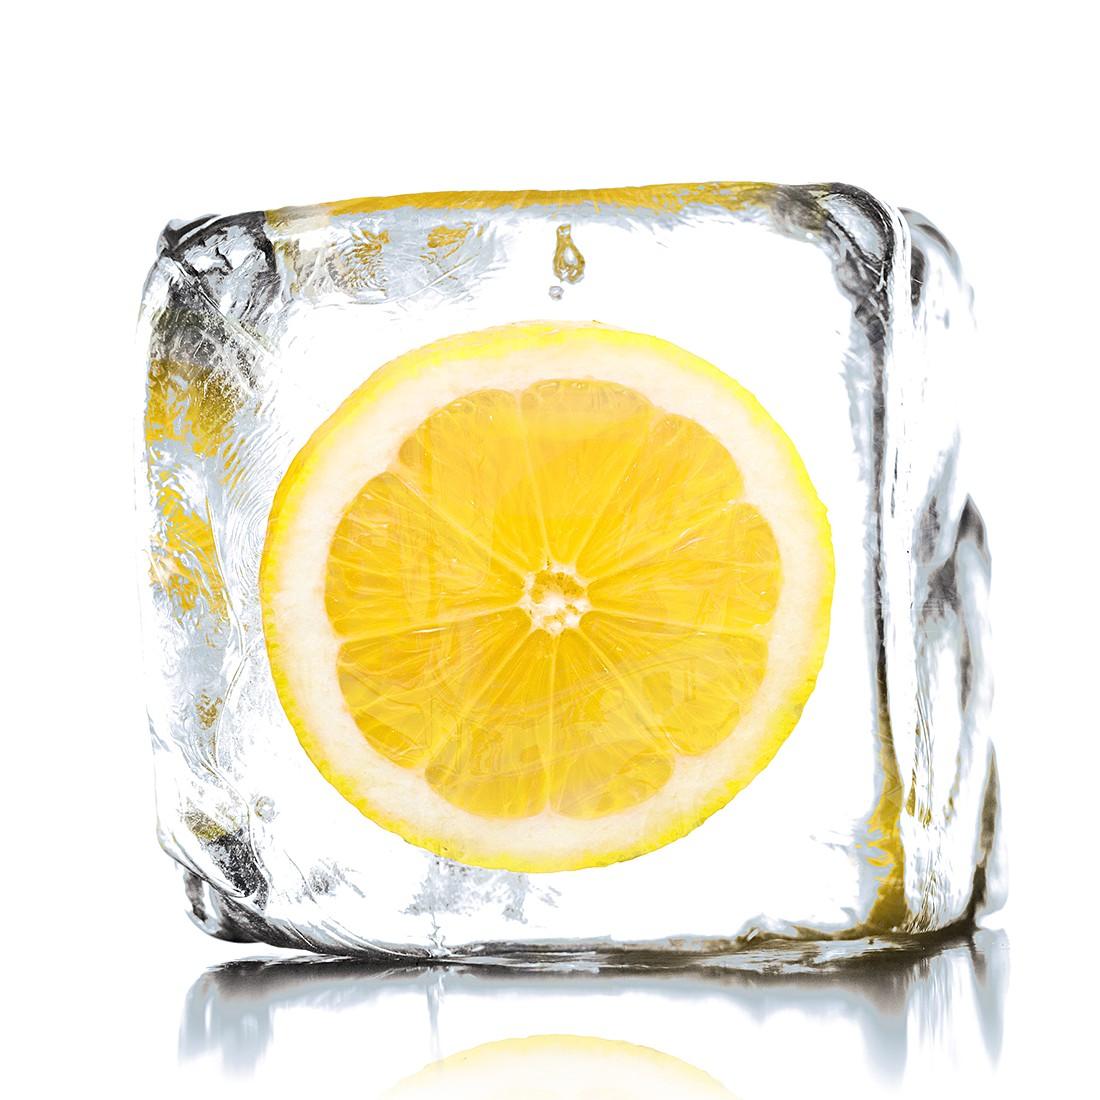 kanavape satijah lemon eliquid 10ml nic 0 0 prezzo e offerte sottocosto. Black Bedroom Furniture Sets. Home Design Ideas